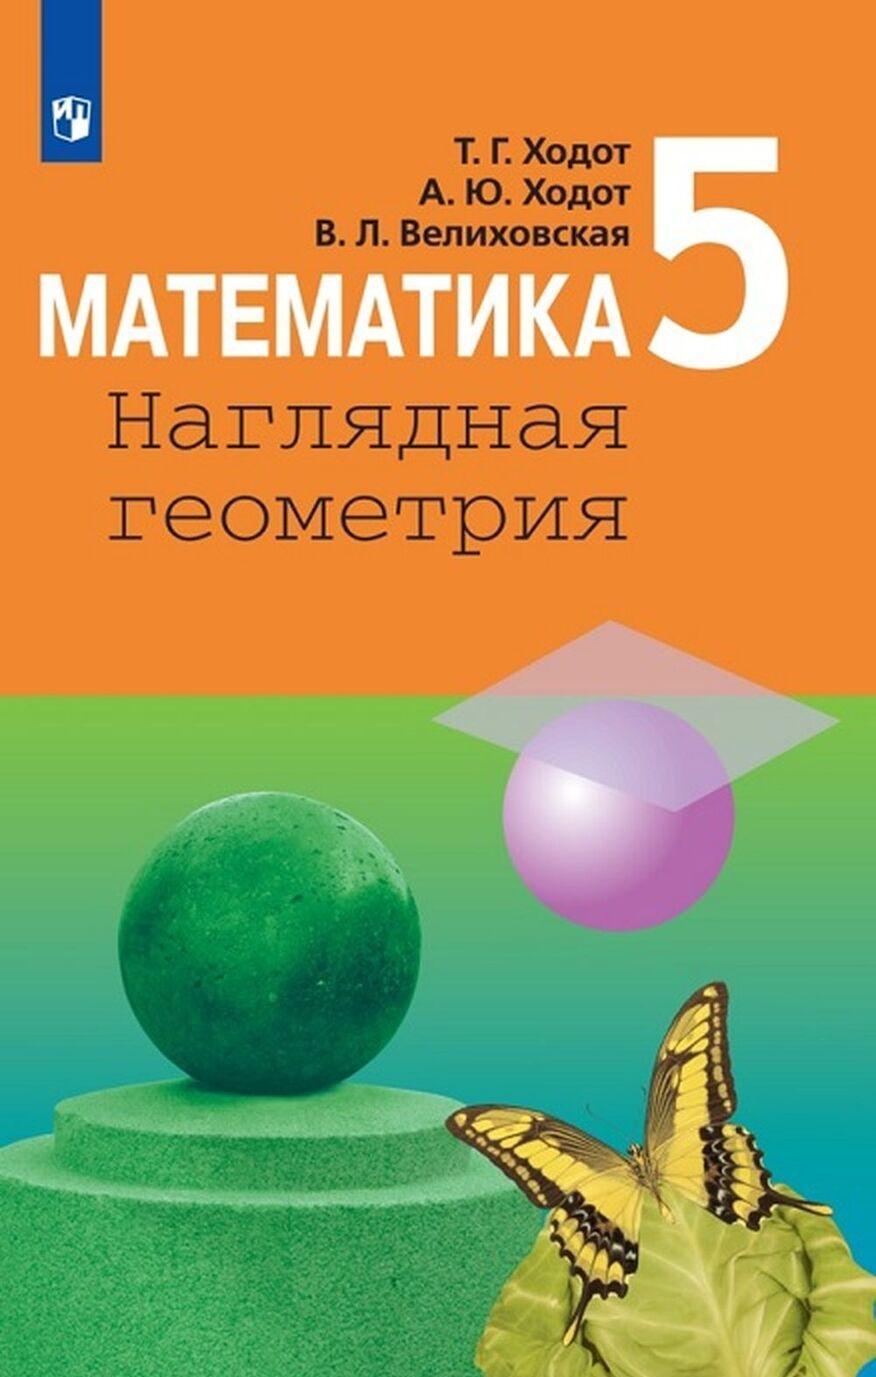 Matematika. Nagljadnaja geometrija. 5 klass.